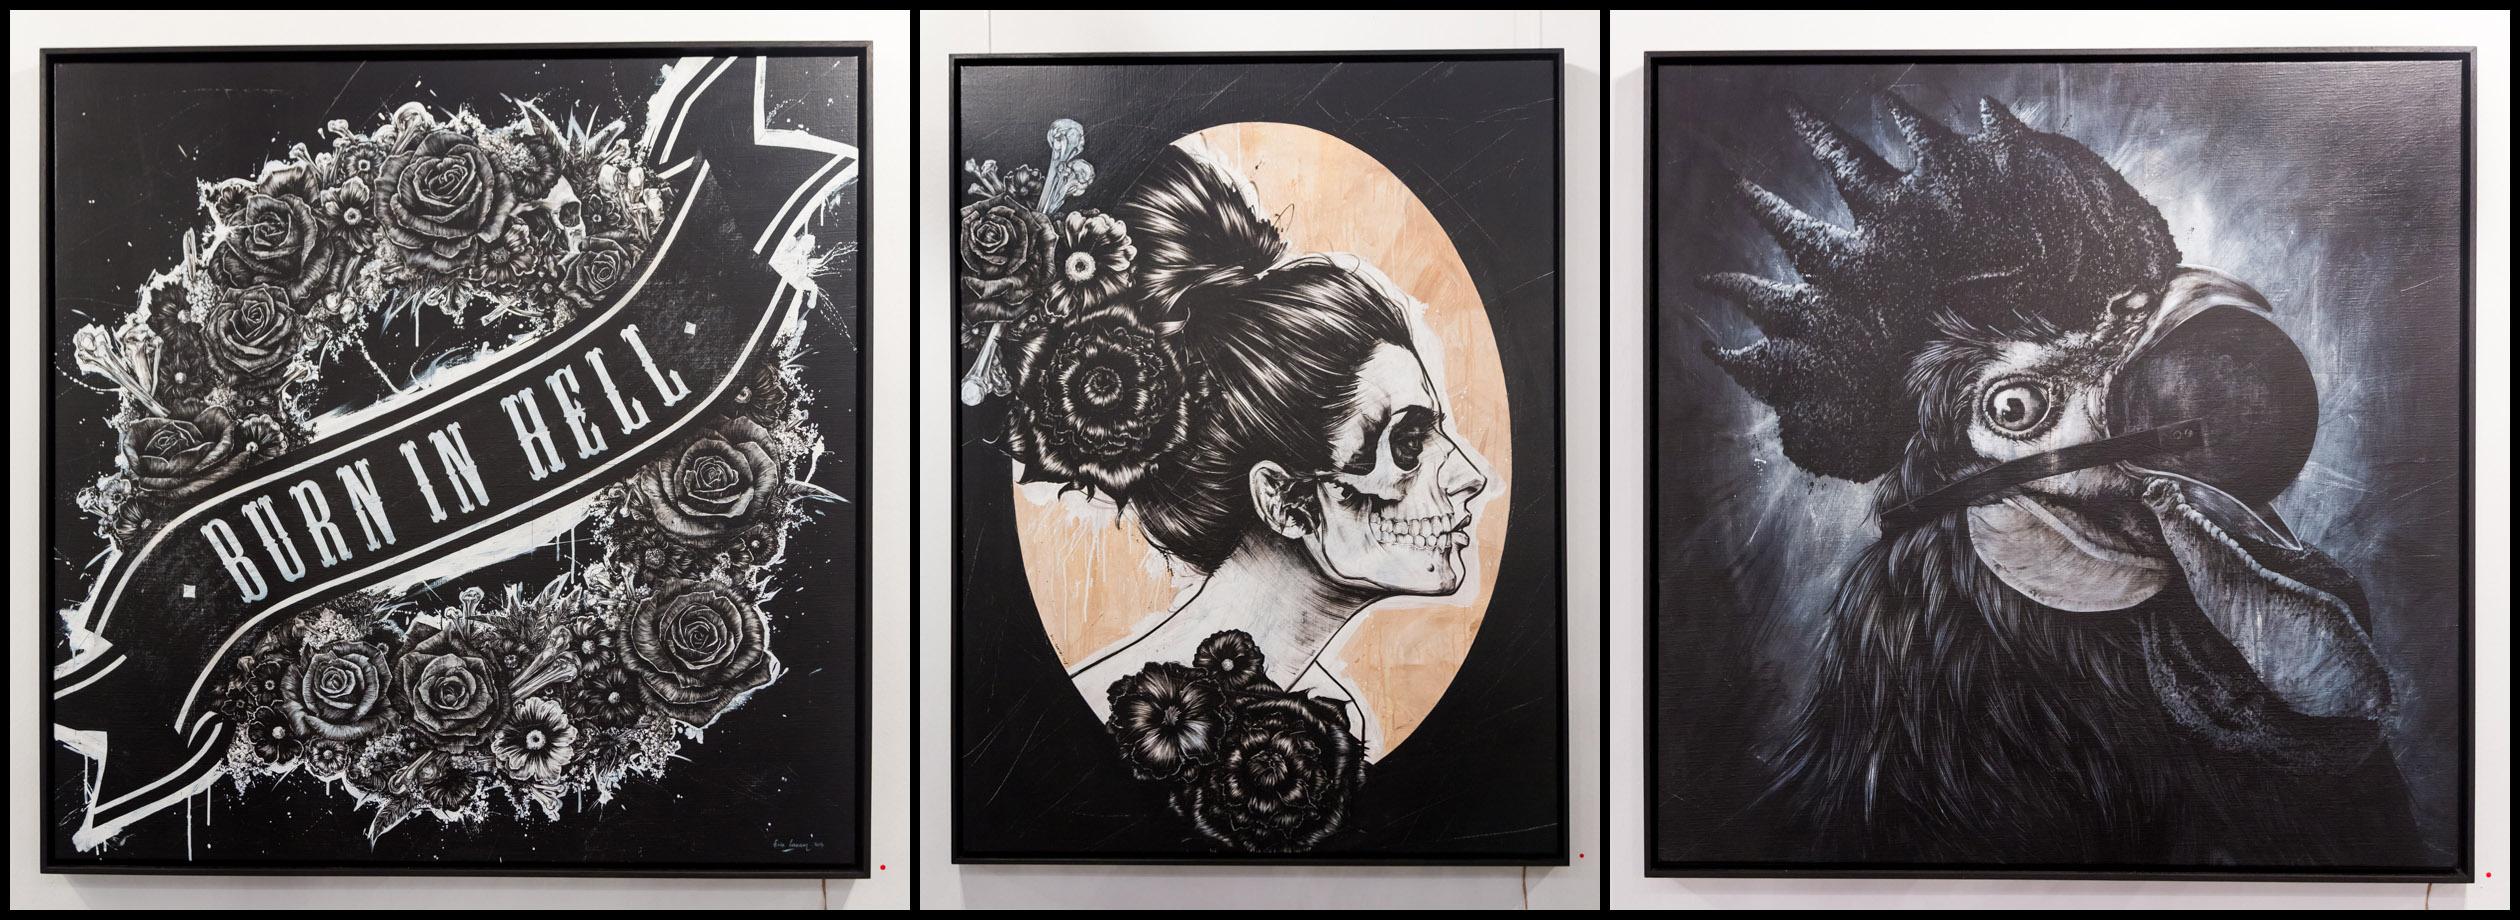 Eric Lacan à a galerie Openspace - Octobre 2014